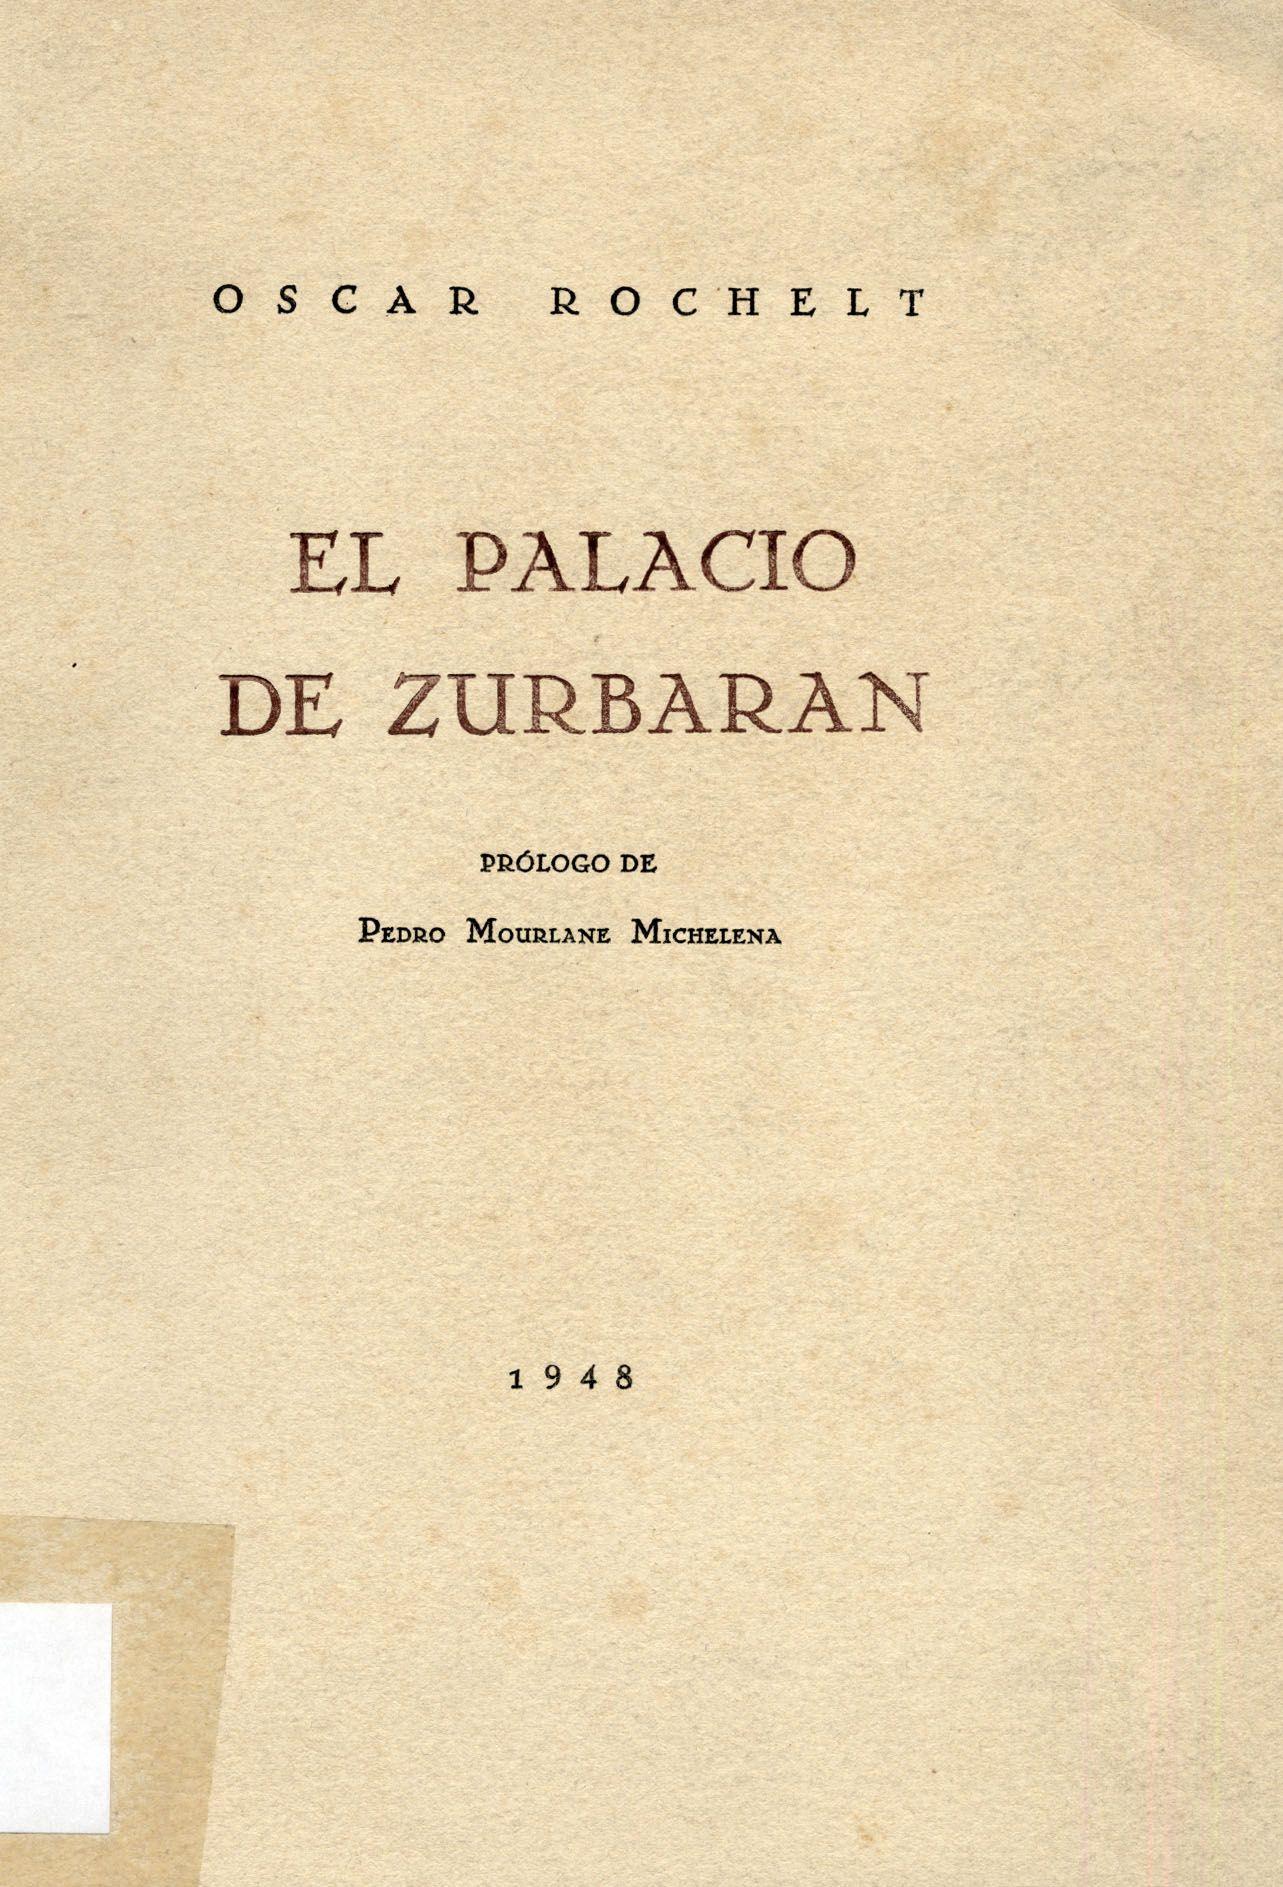 EL PALACIO DE ZURBARAN (Oscar Rochelt), Imprenta Librería Moderna, 1948.